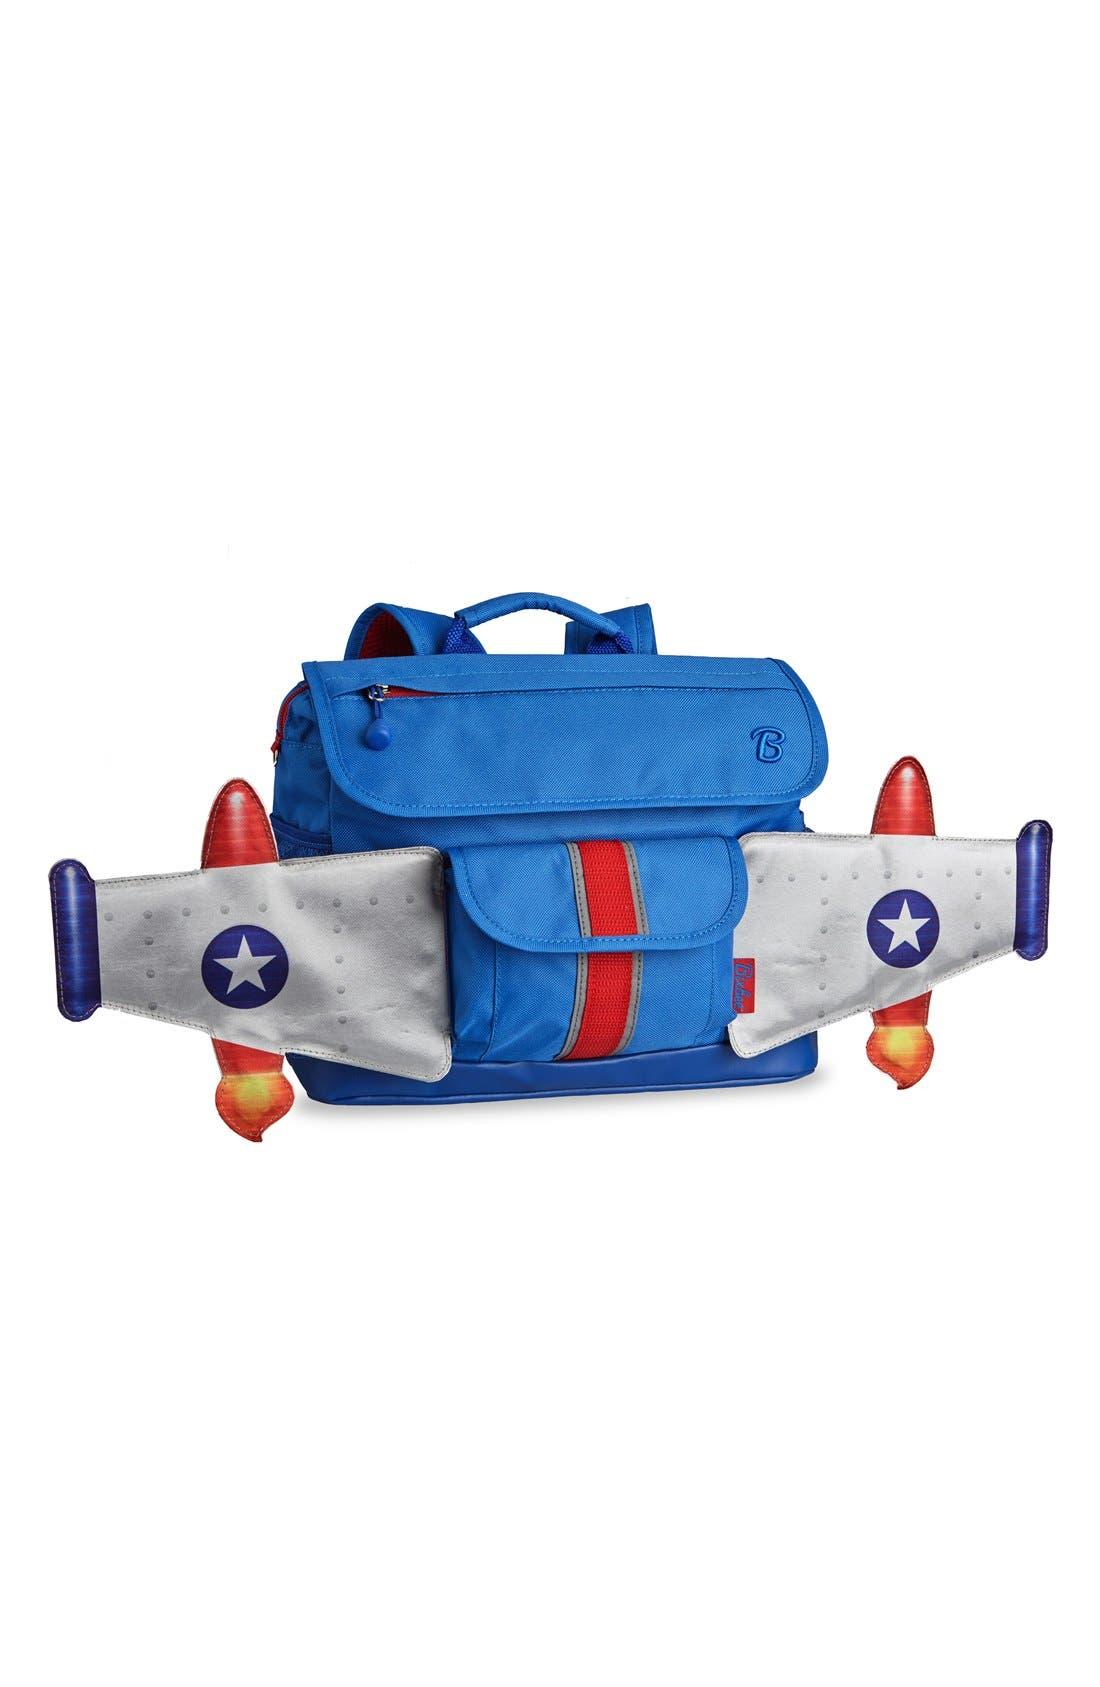 Bixbee 'Rocketflyer' Water Resistant Backpack (Kids)